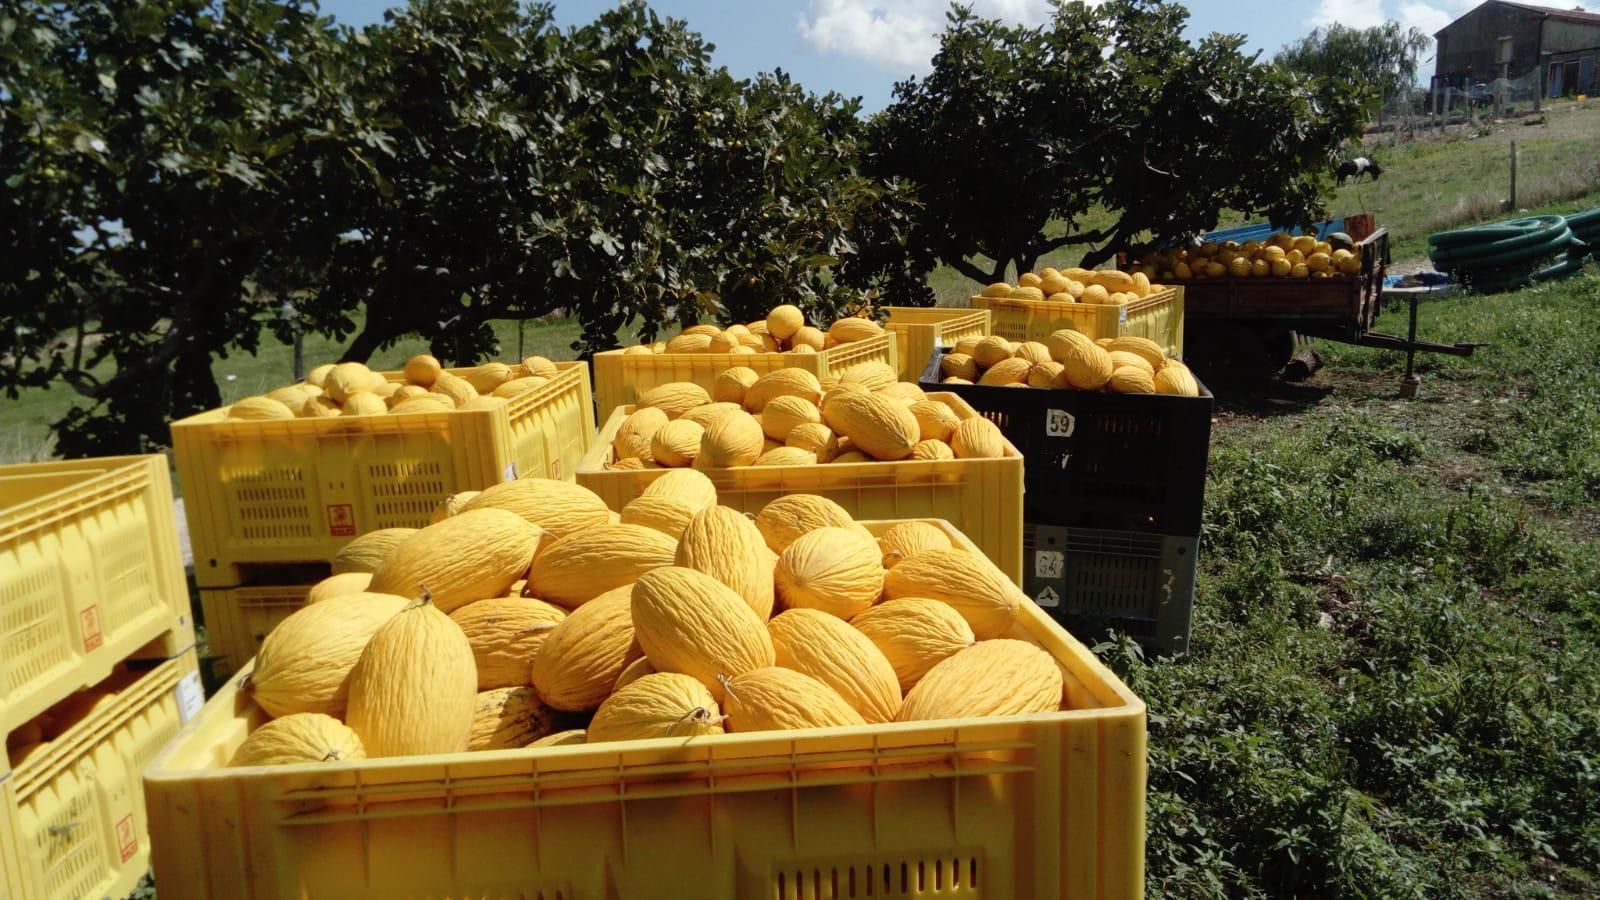 Meloni gialli rugosi nei campi